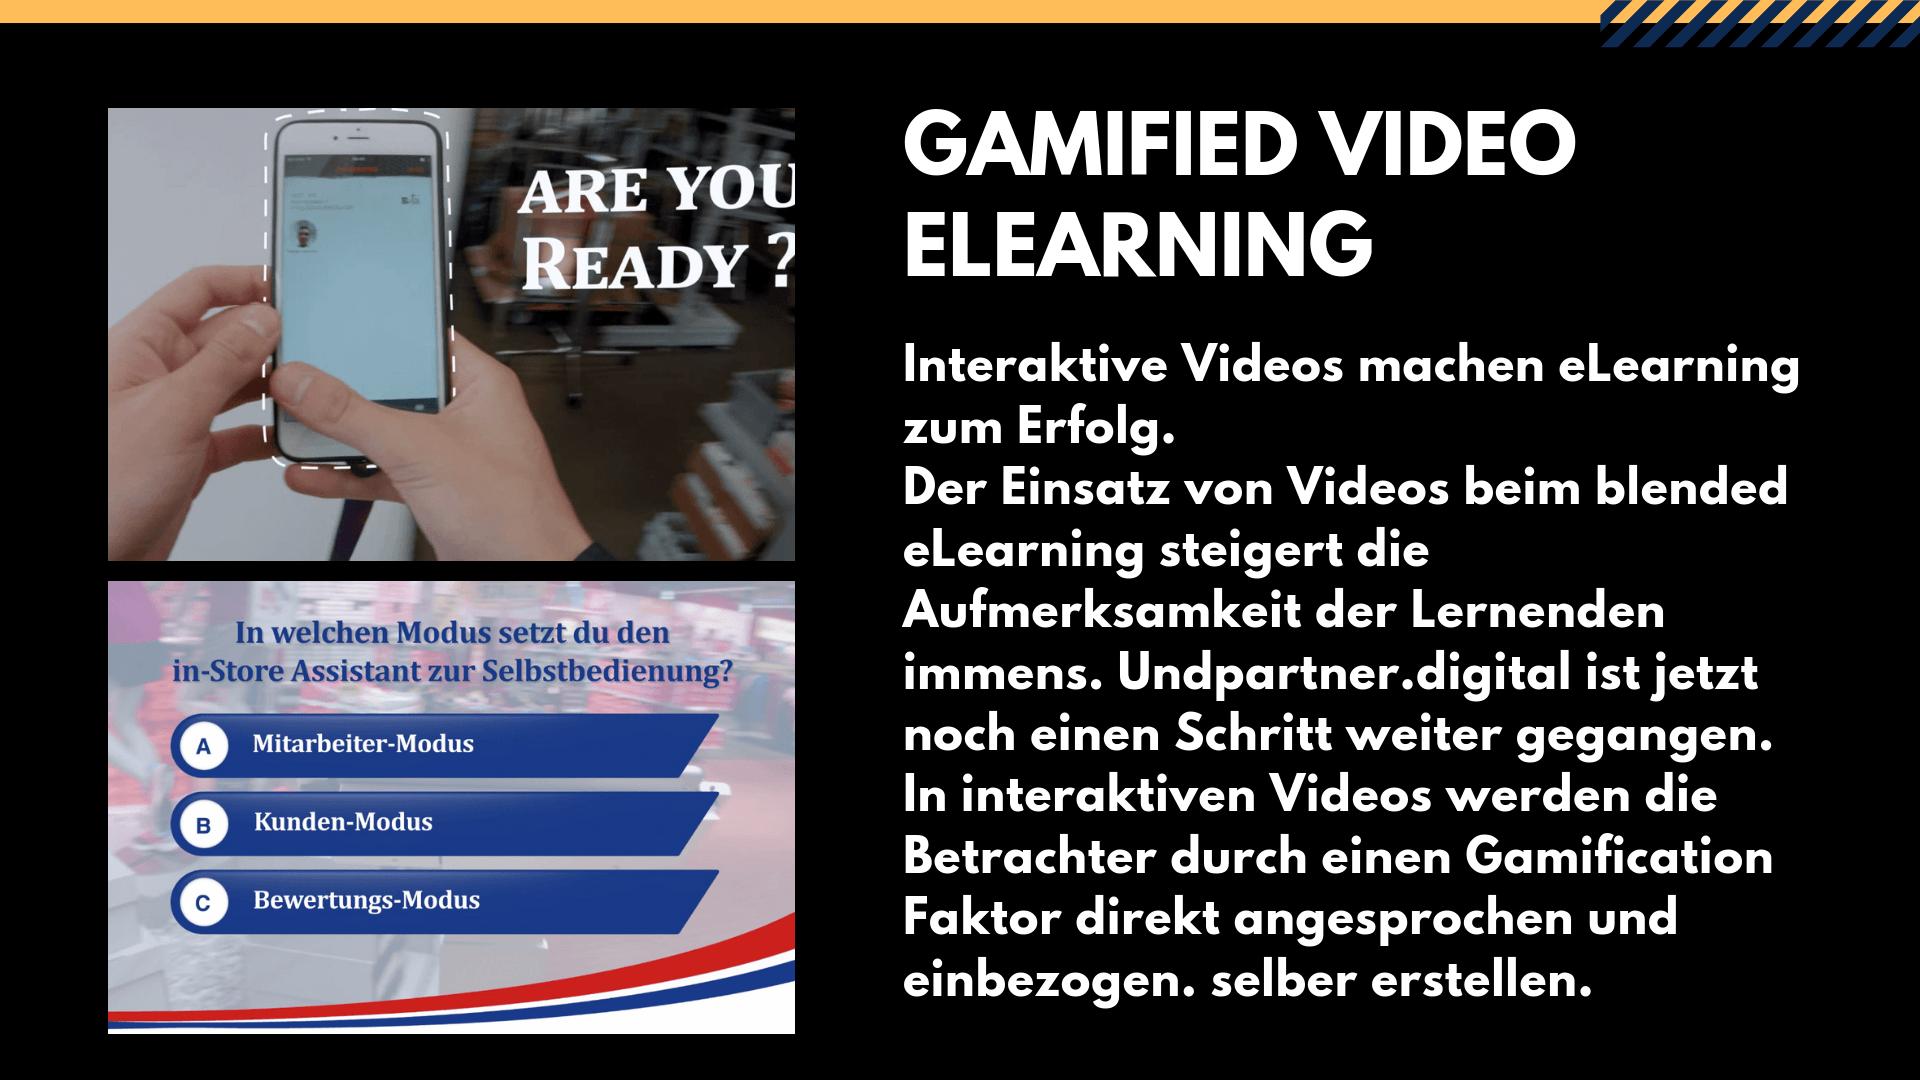 elearnig interaktive videos